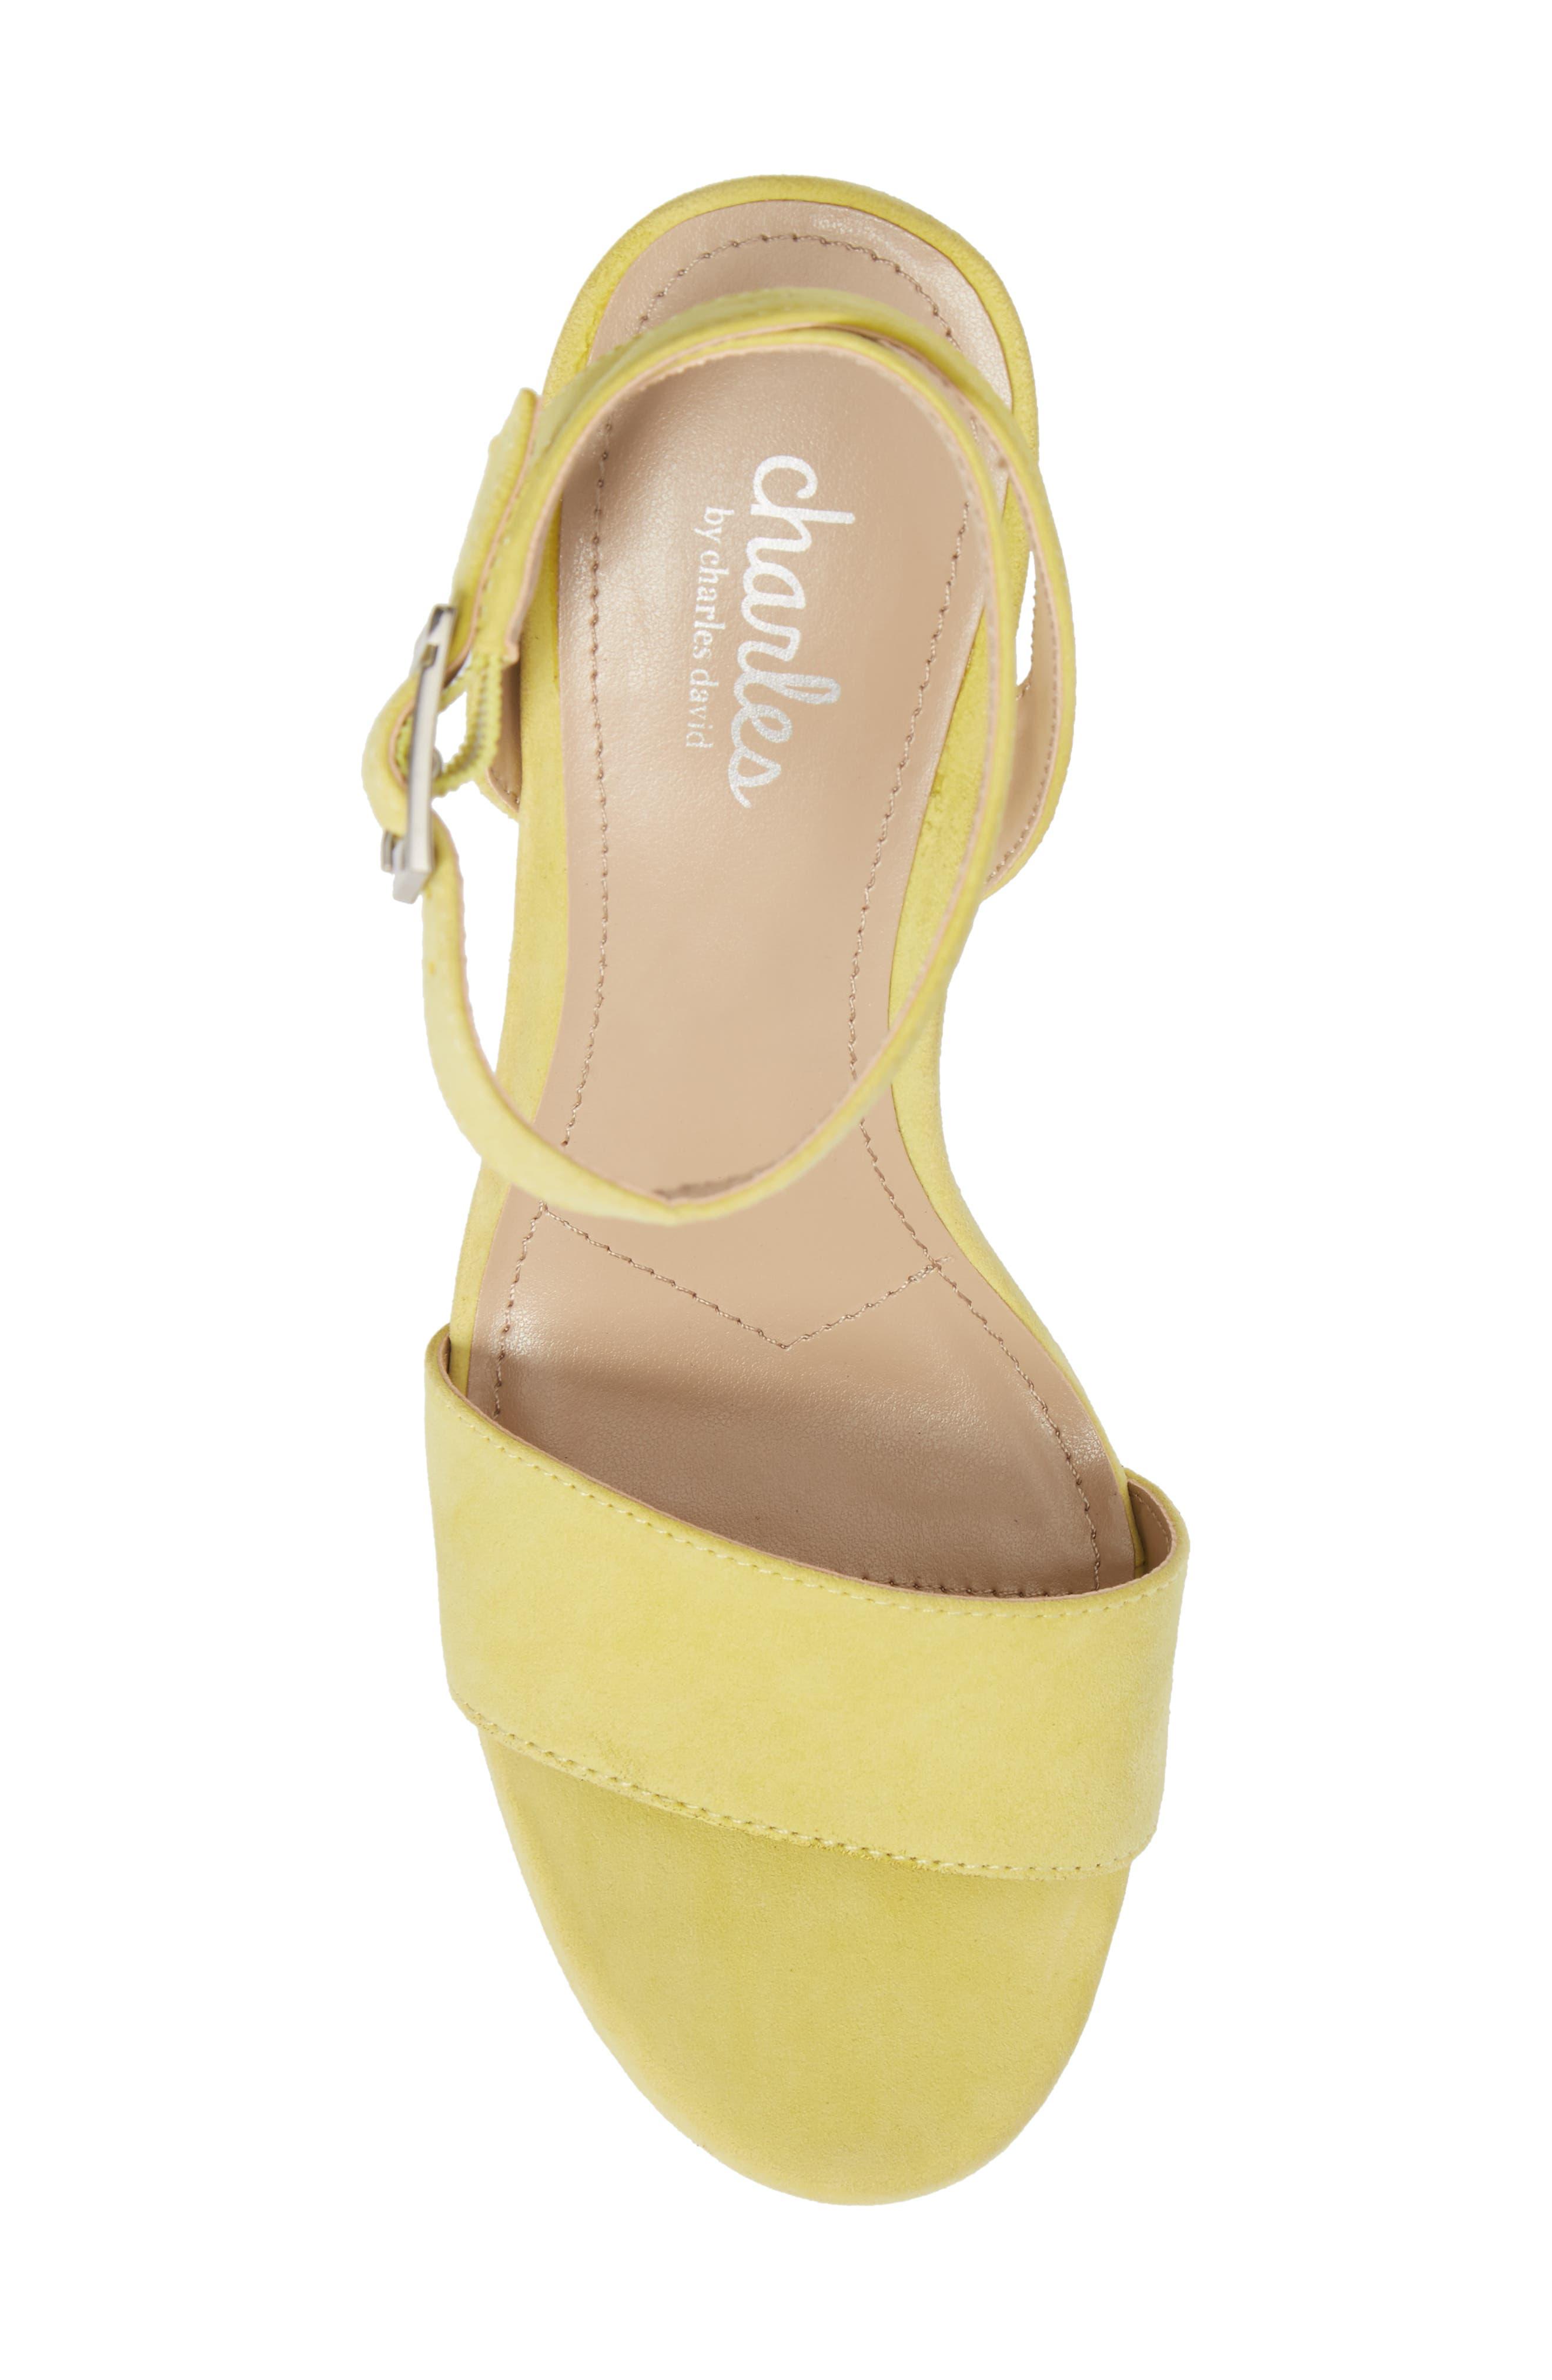 Lilla Platform Wedge Sandal,                             Alternate thumbnail 5, color,                             Yellow Suede